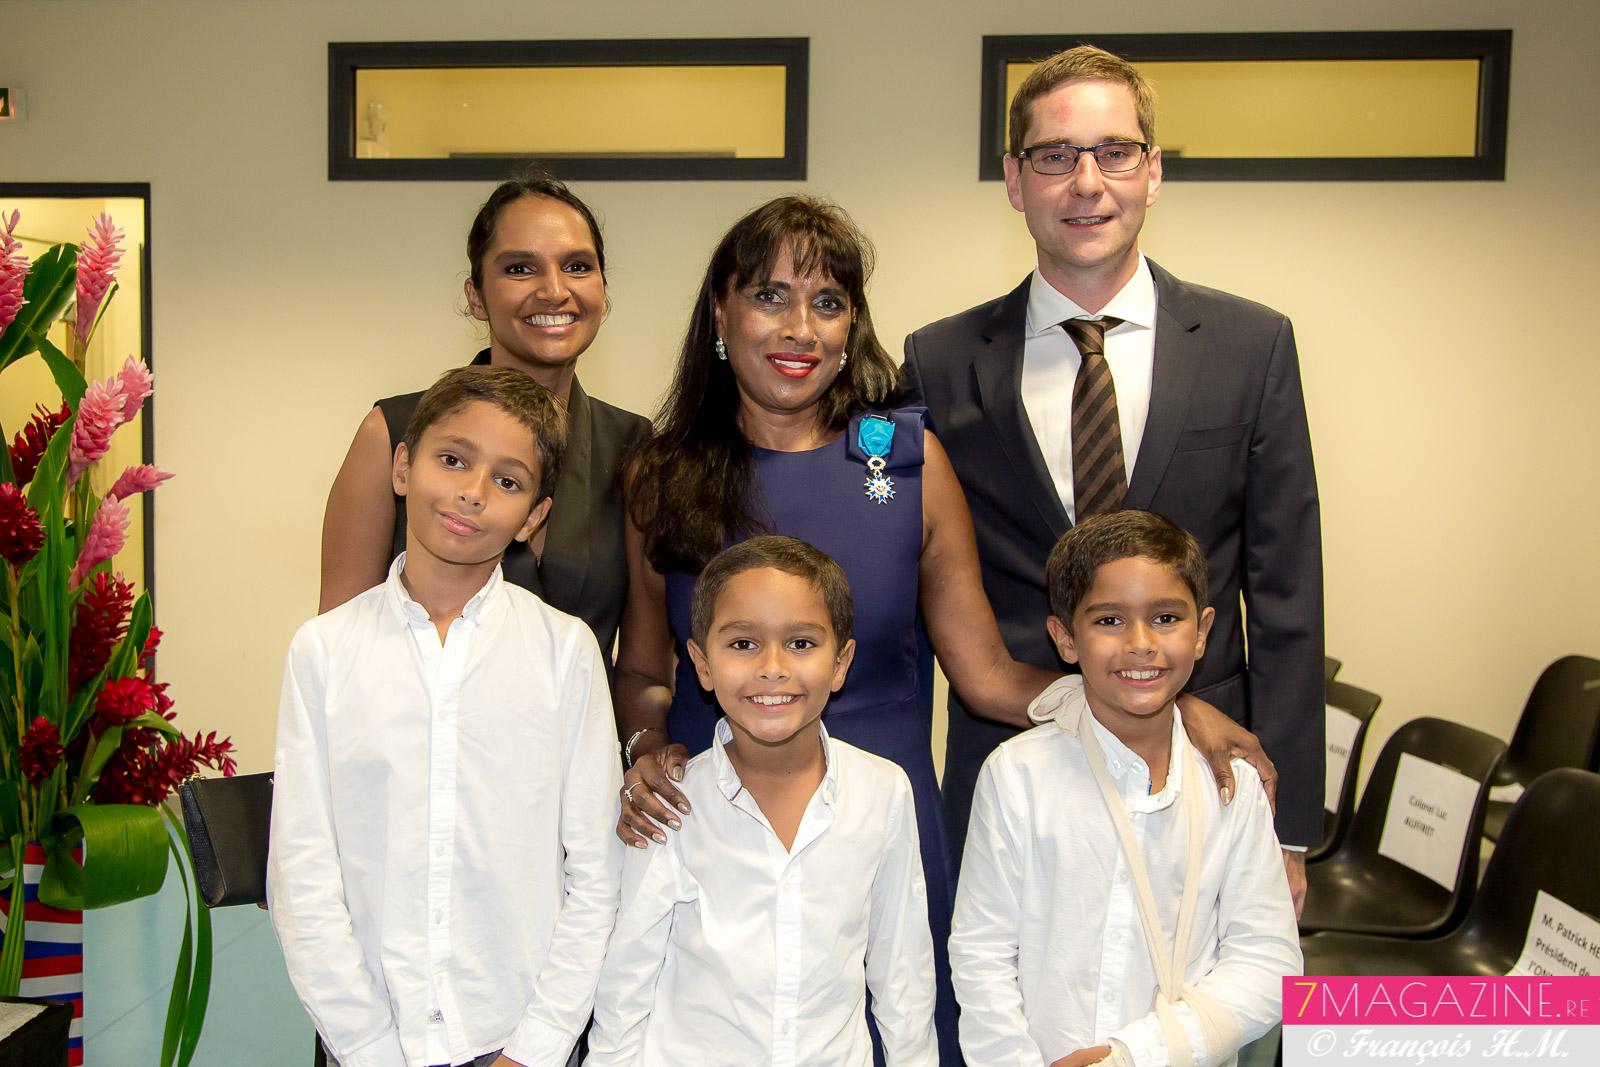 Ida avec sa fille Cyndie, son gendre Grégory, et ses petits-enfants